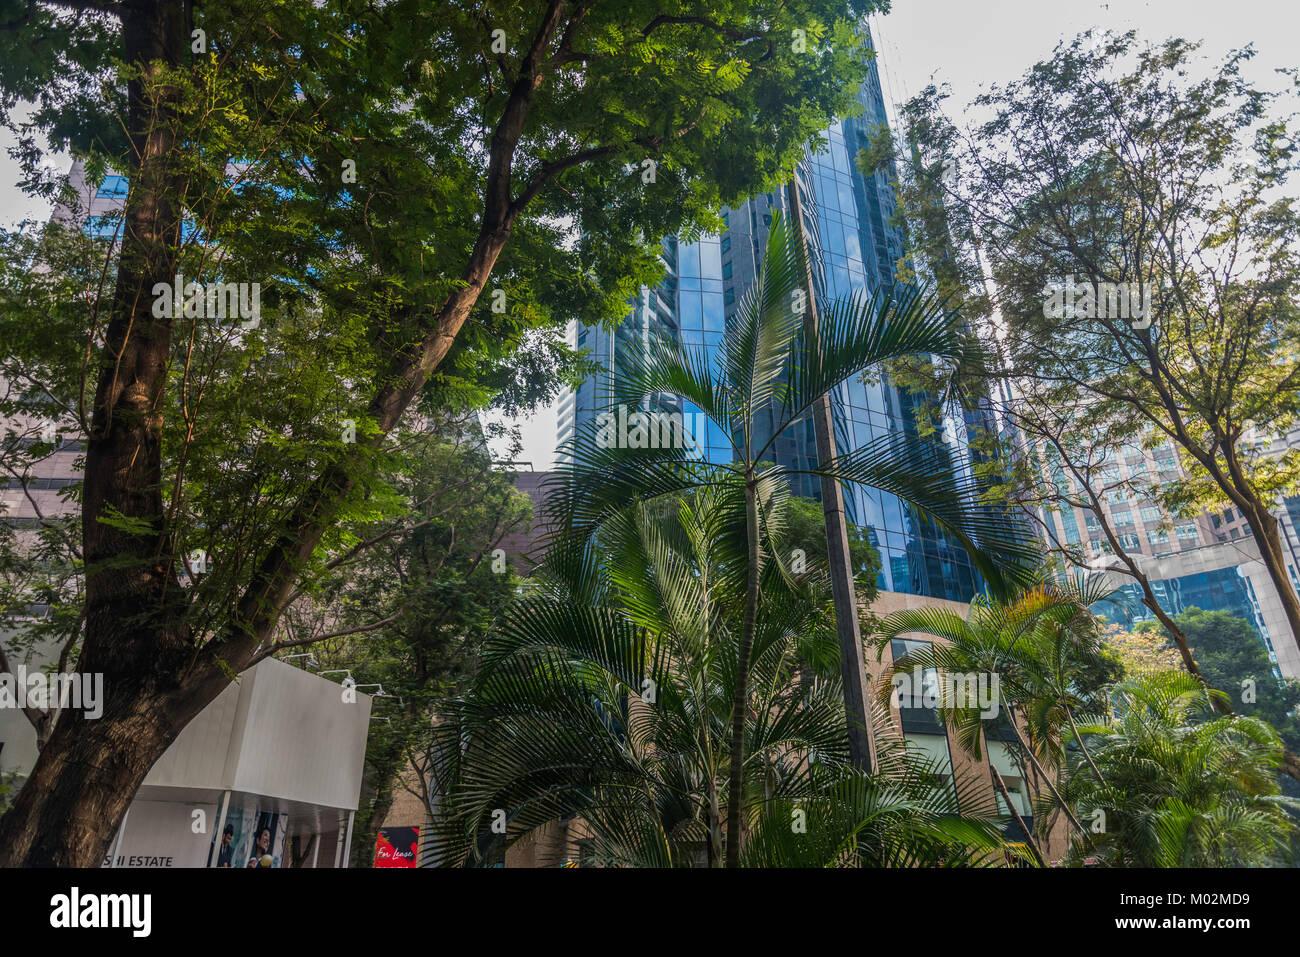 architecture of Downton Core, Marina Bay, Singapore - Stock Image